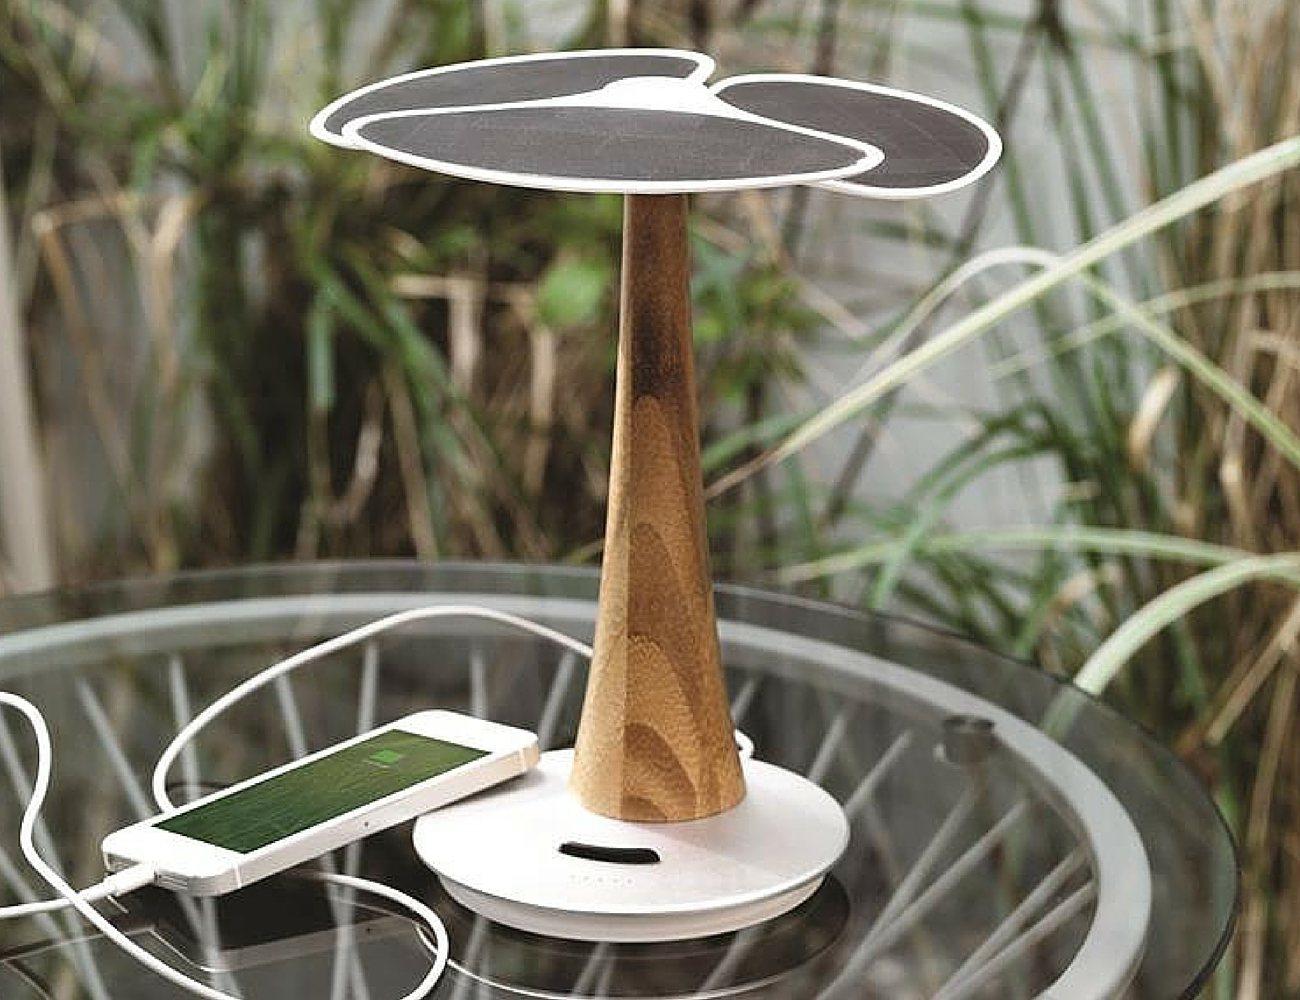 Ginkgo Solar Tree – Eco-friendly Solar Charger